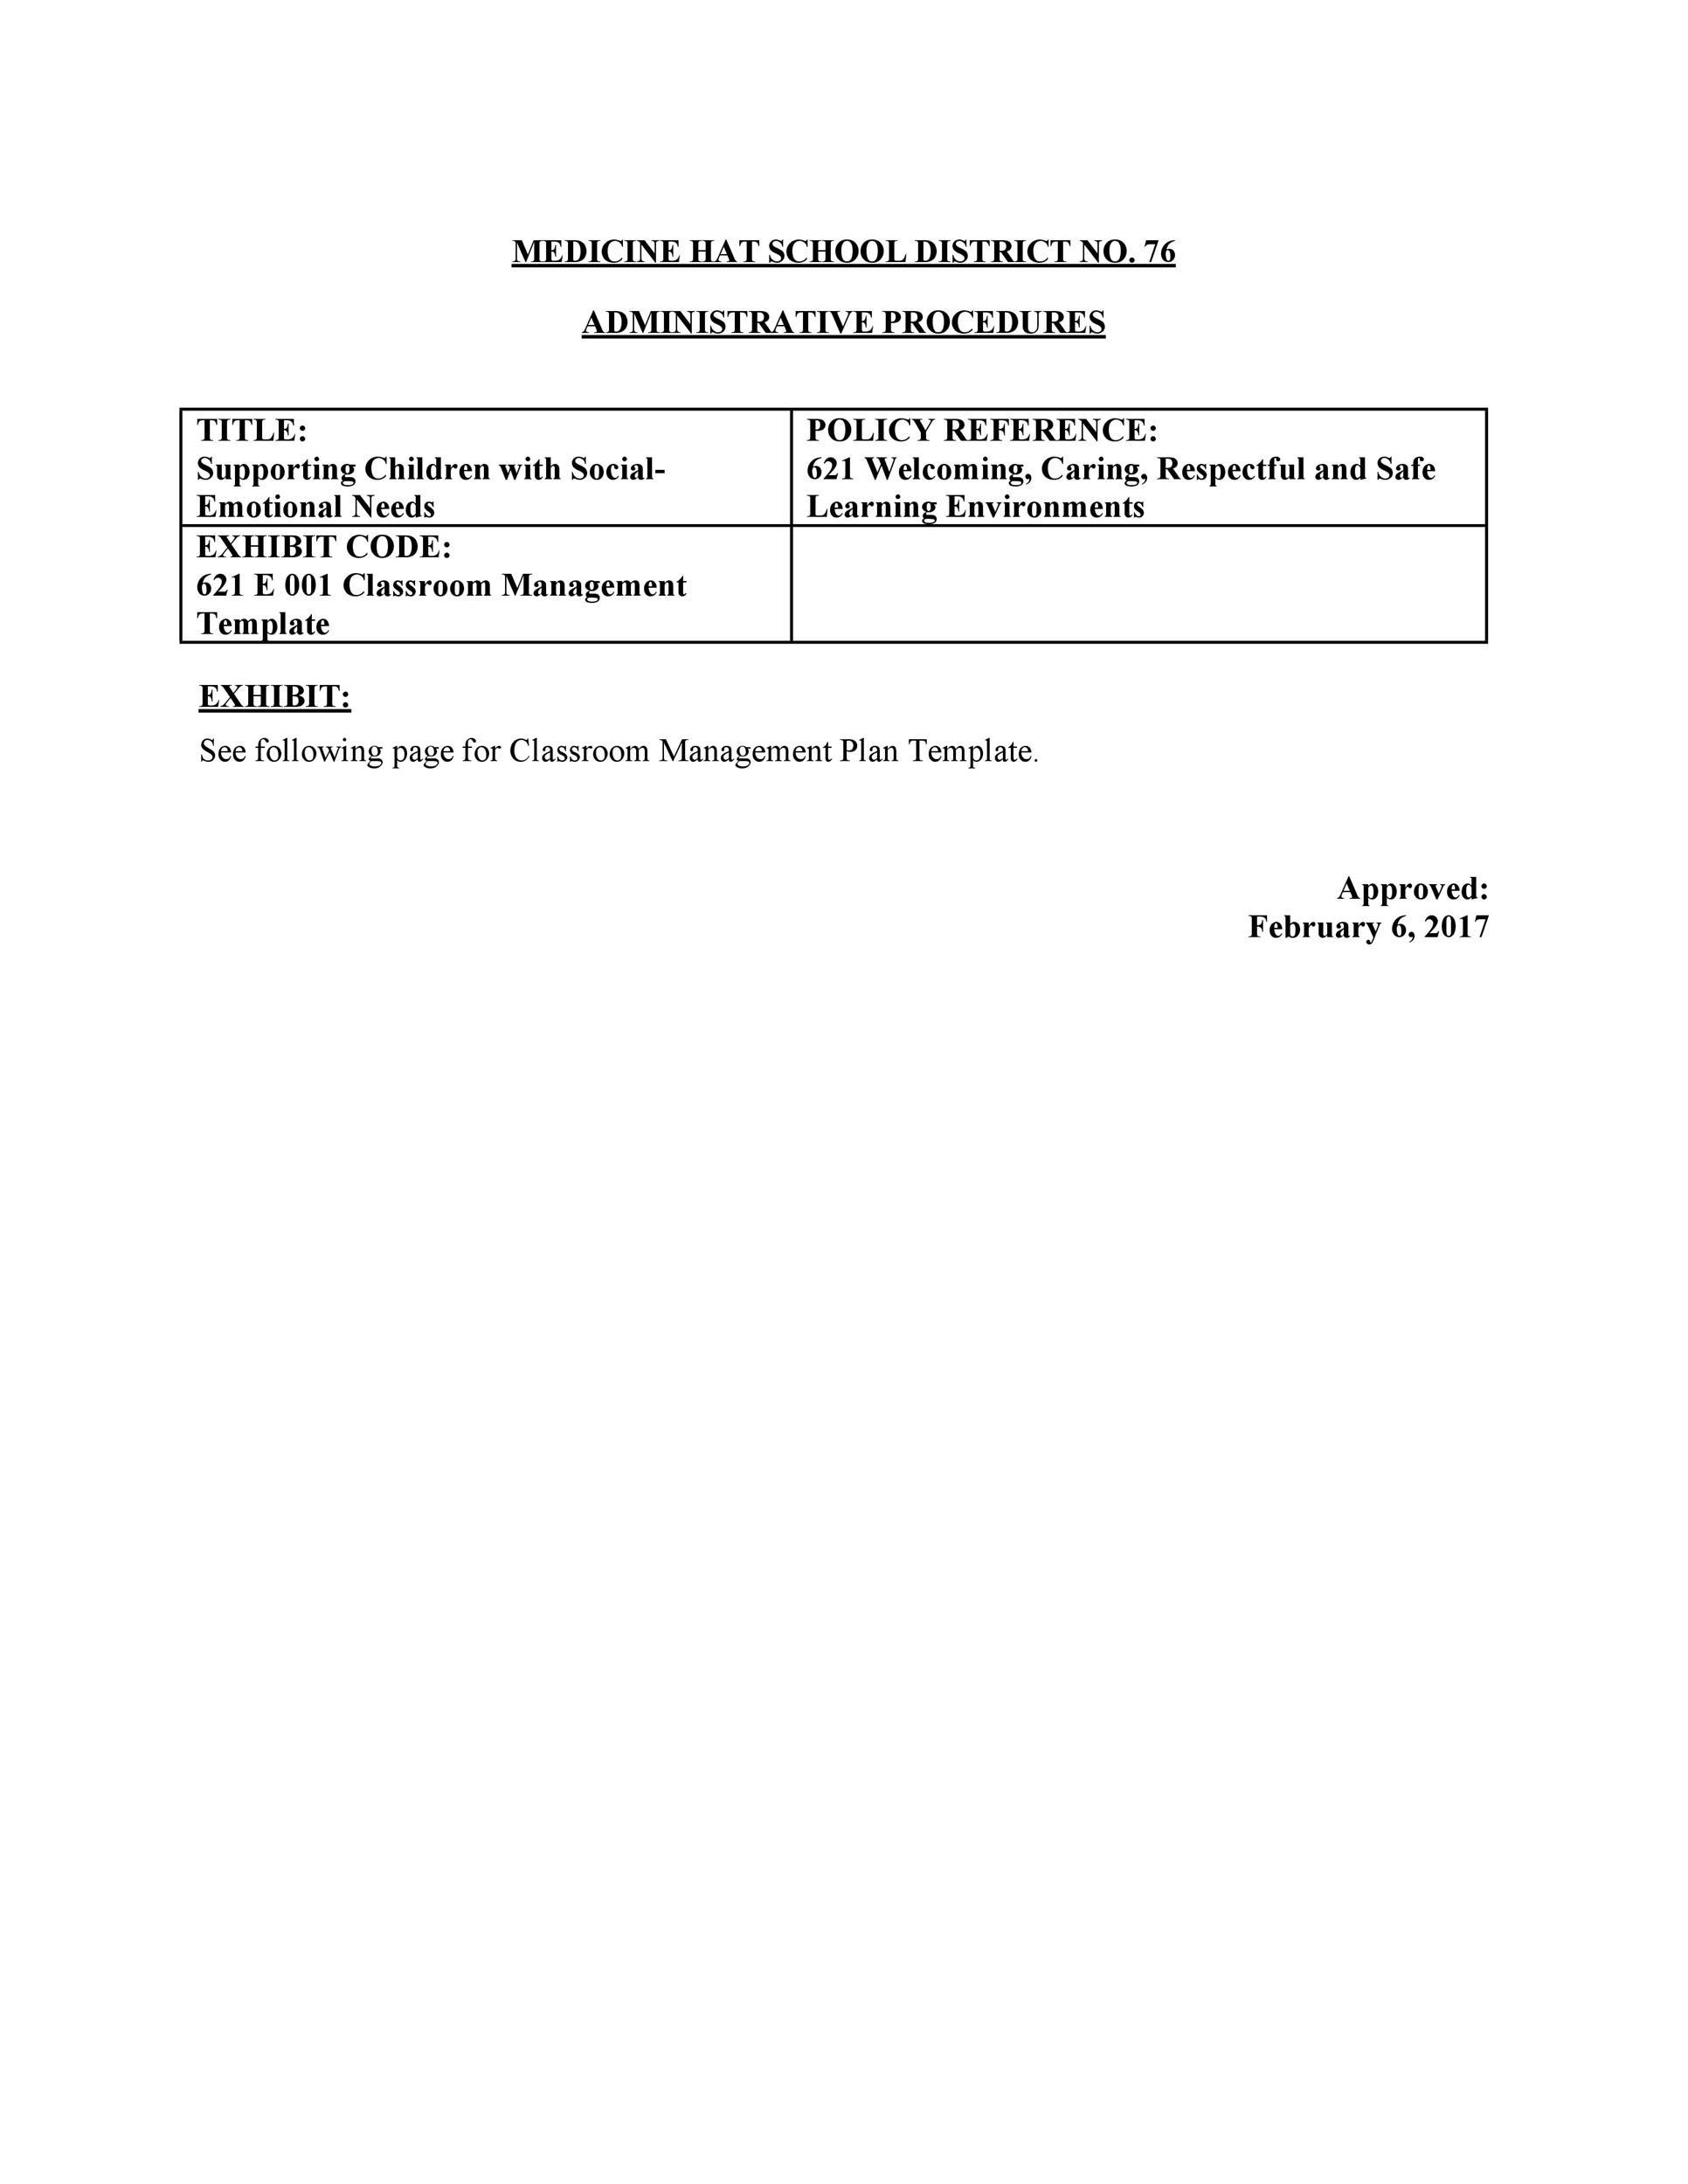 Free classroom management plan 11